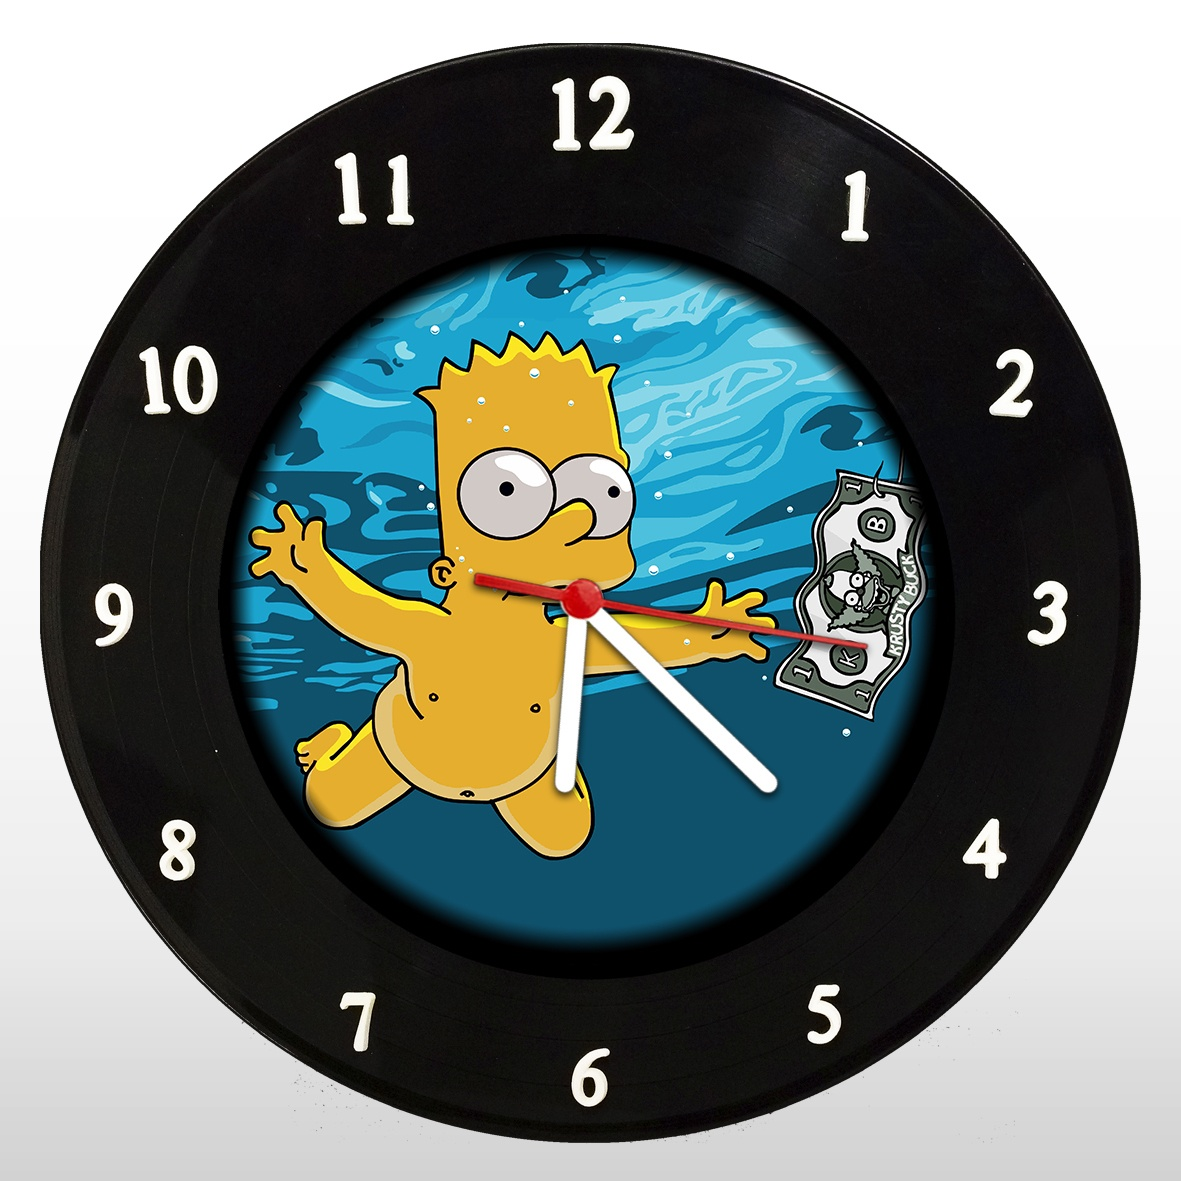 The Simpsons - Nevermind - Bart - Relógio de Parede em Disco de Vinil - Mr. Rock